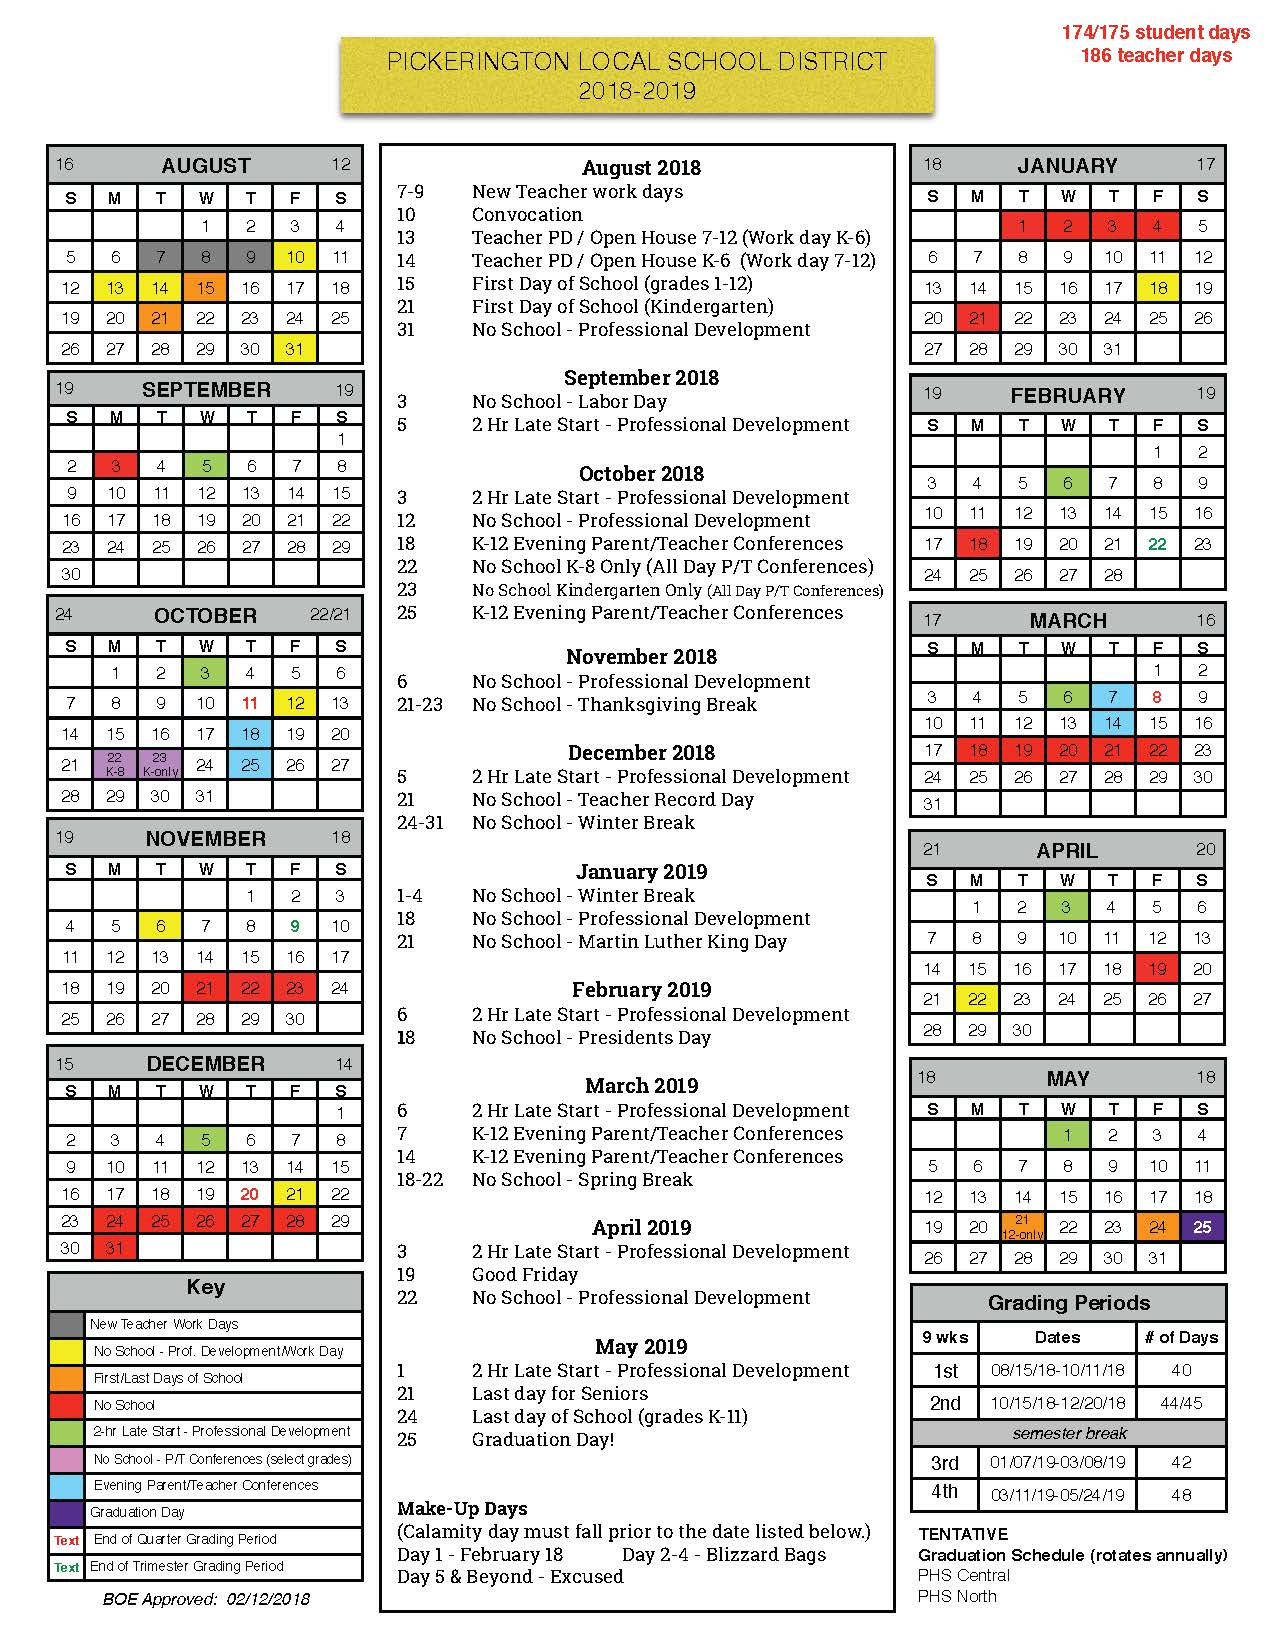 Board Of Education Approves 2018 19 Calendar - Pickerington With Regard To Board Of Education Calendar